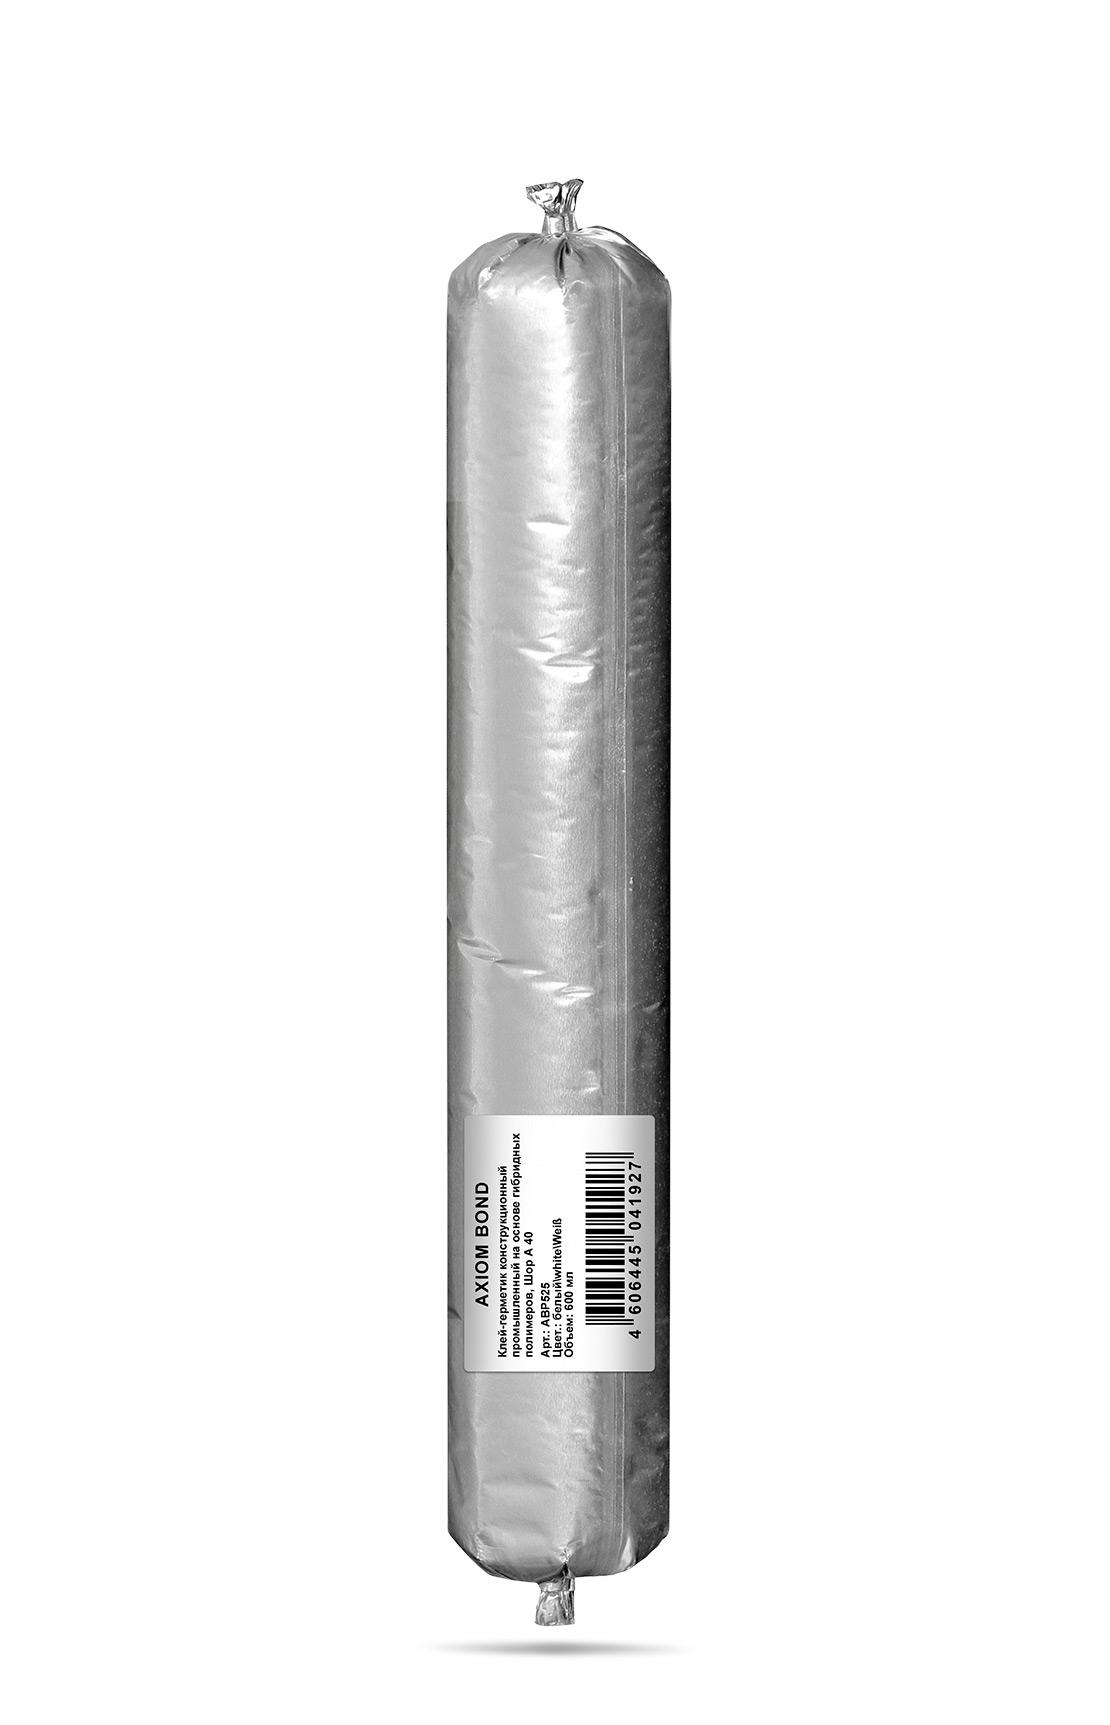 ABP525